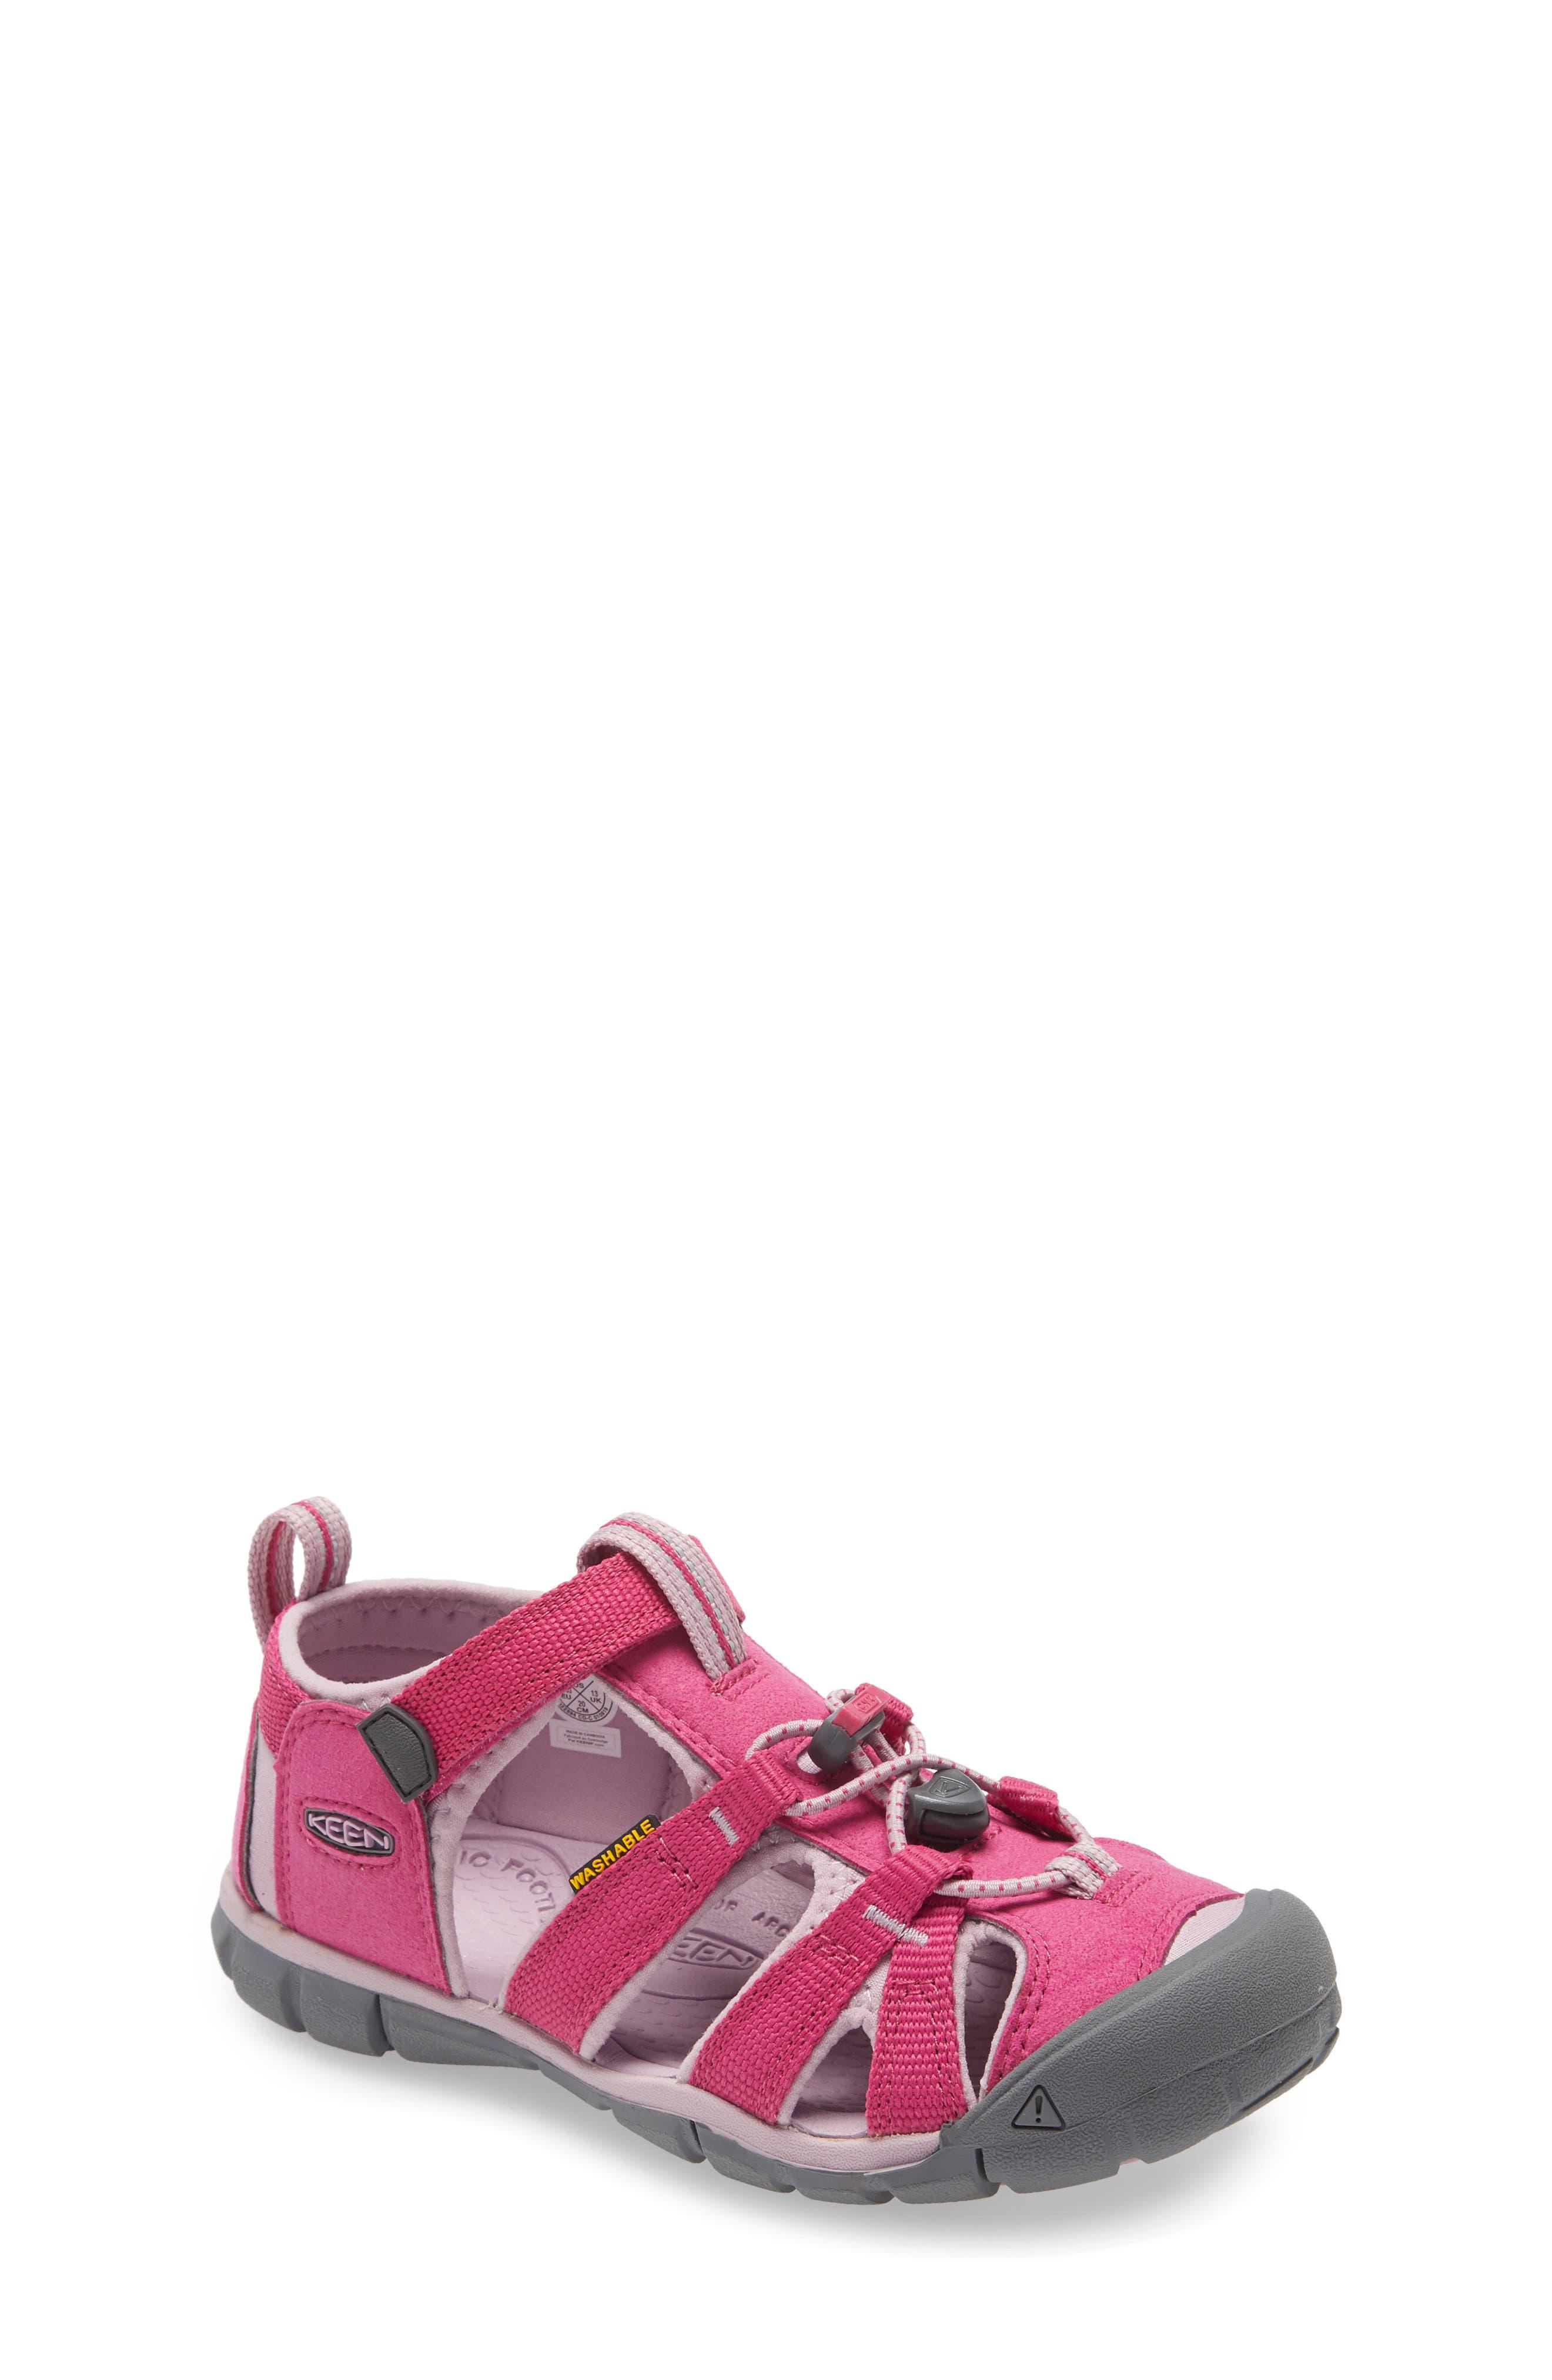 Girls' Keen Shoes